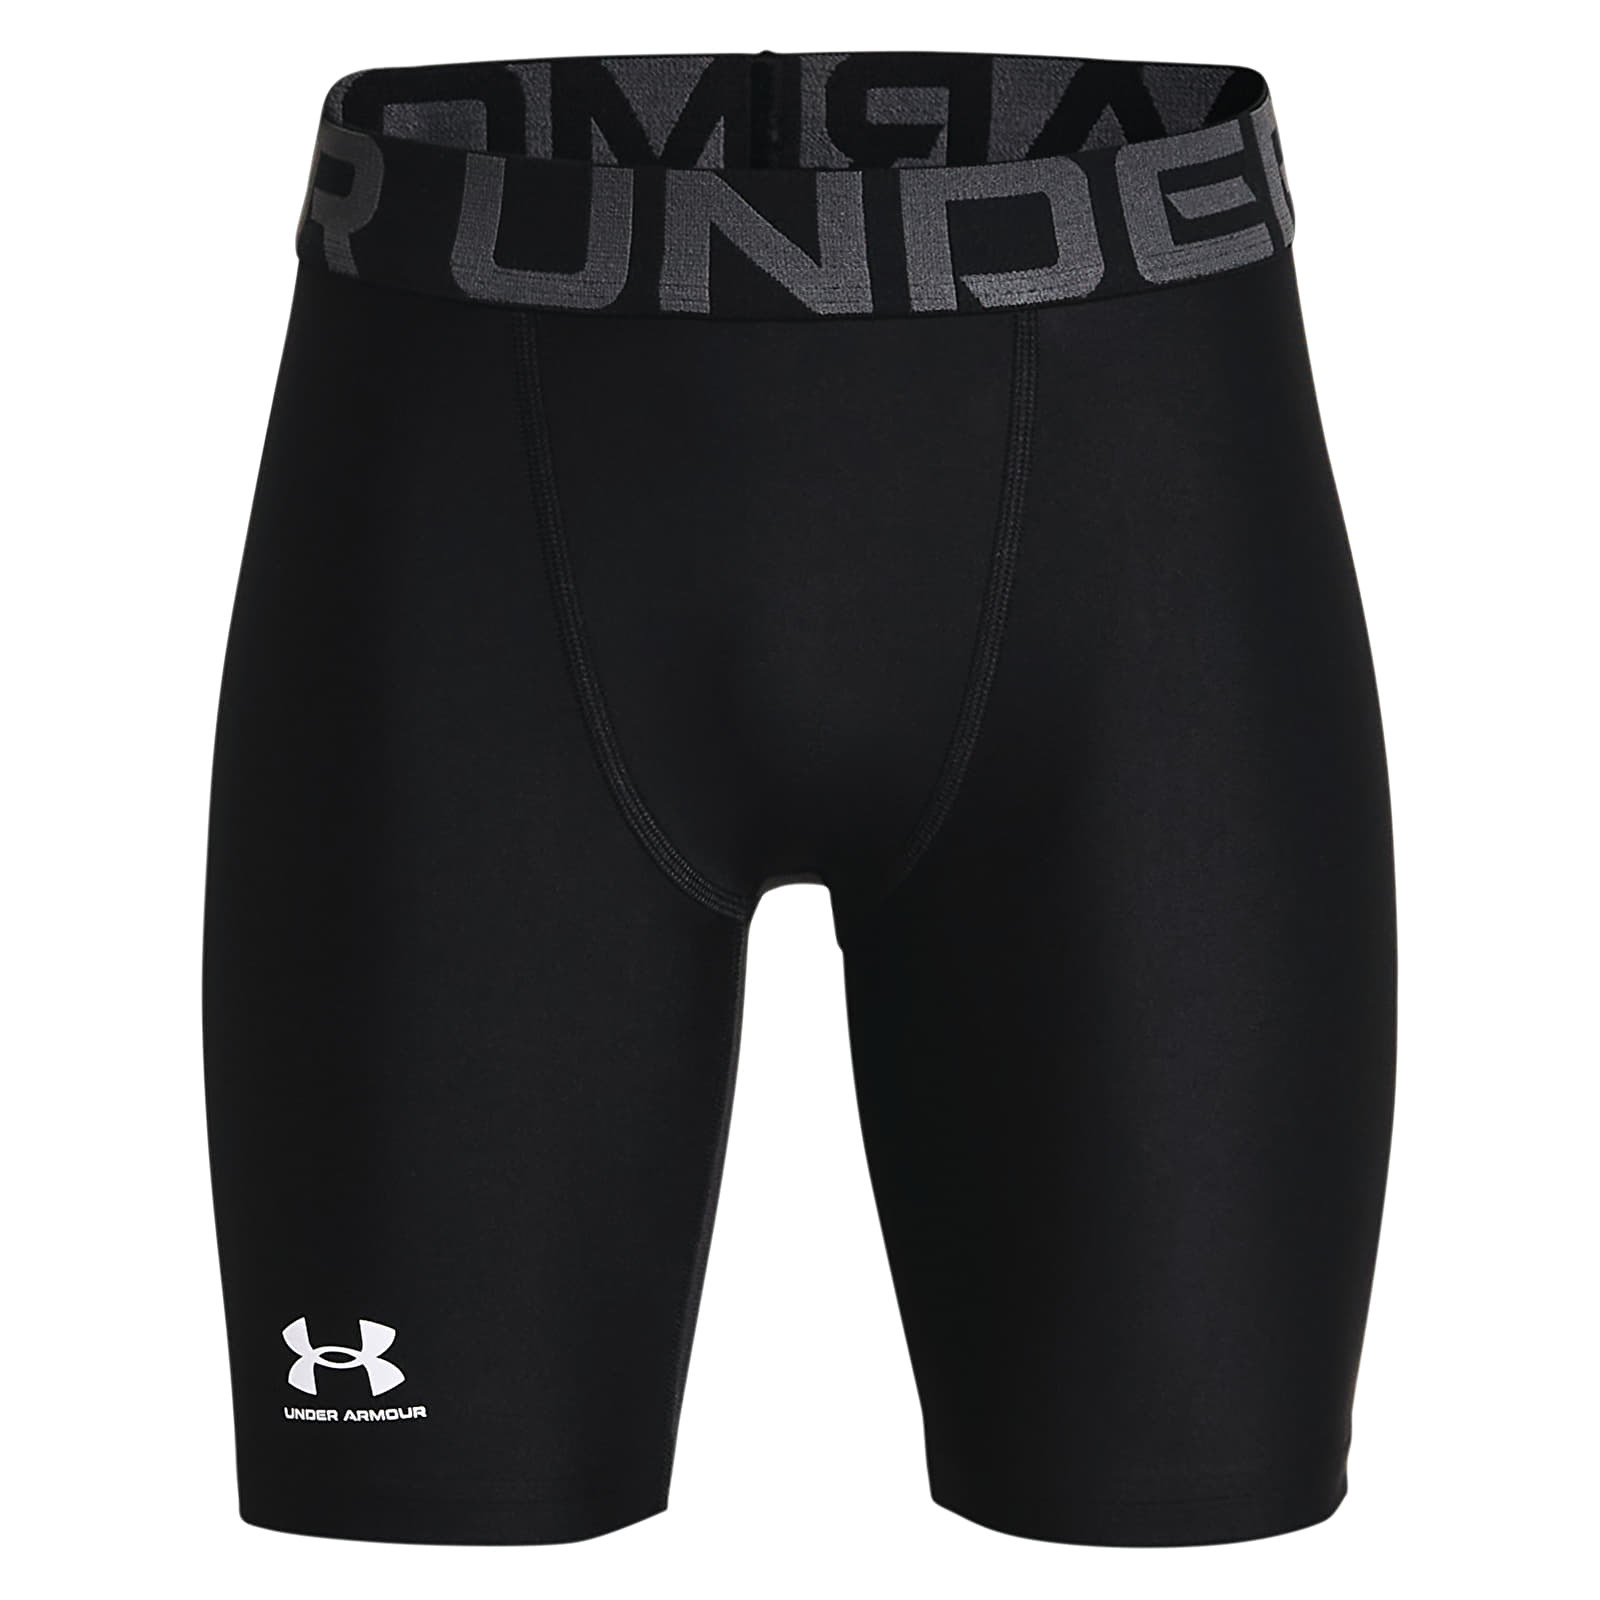 Under Armour Y Hg Shorts Black